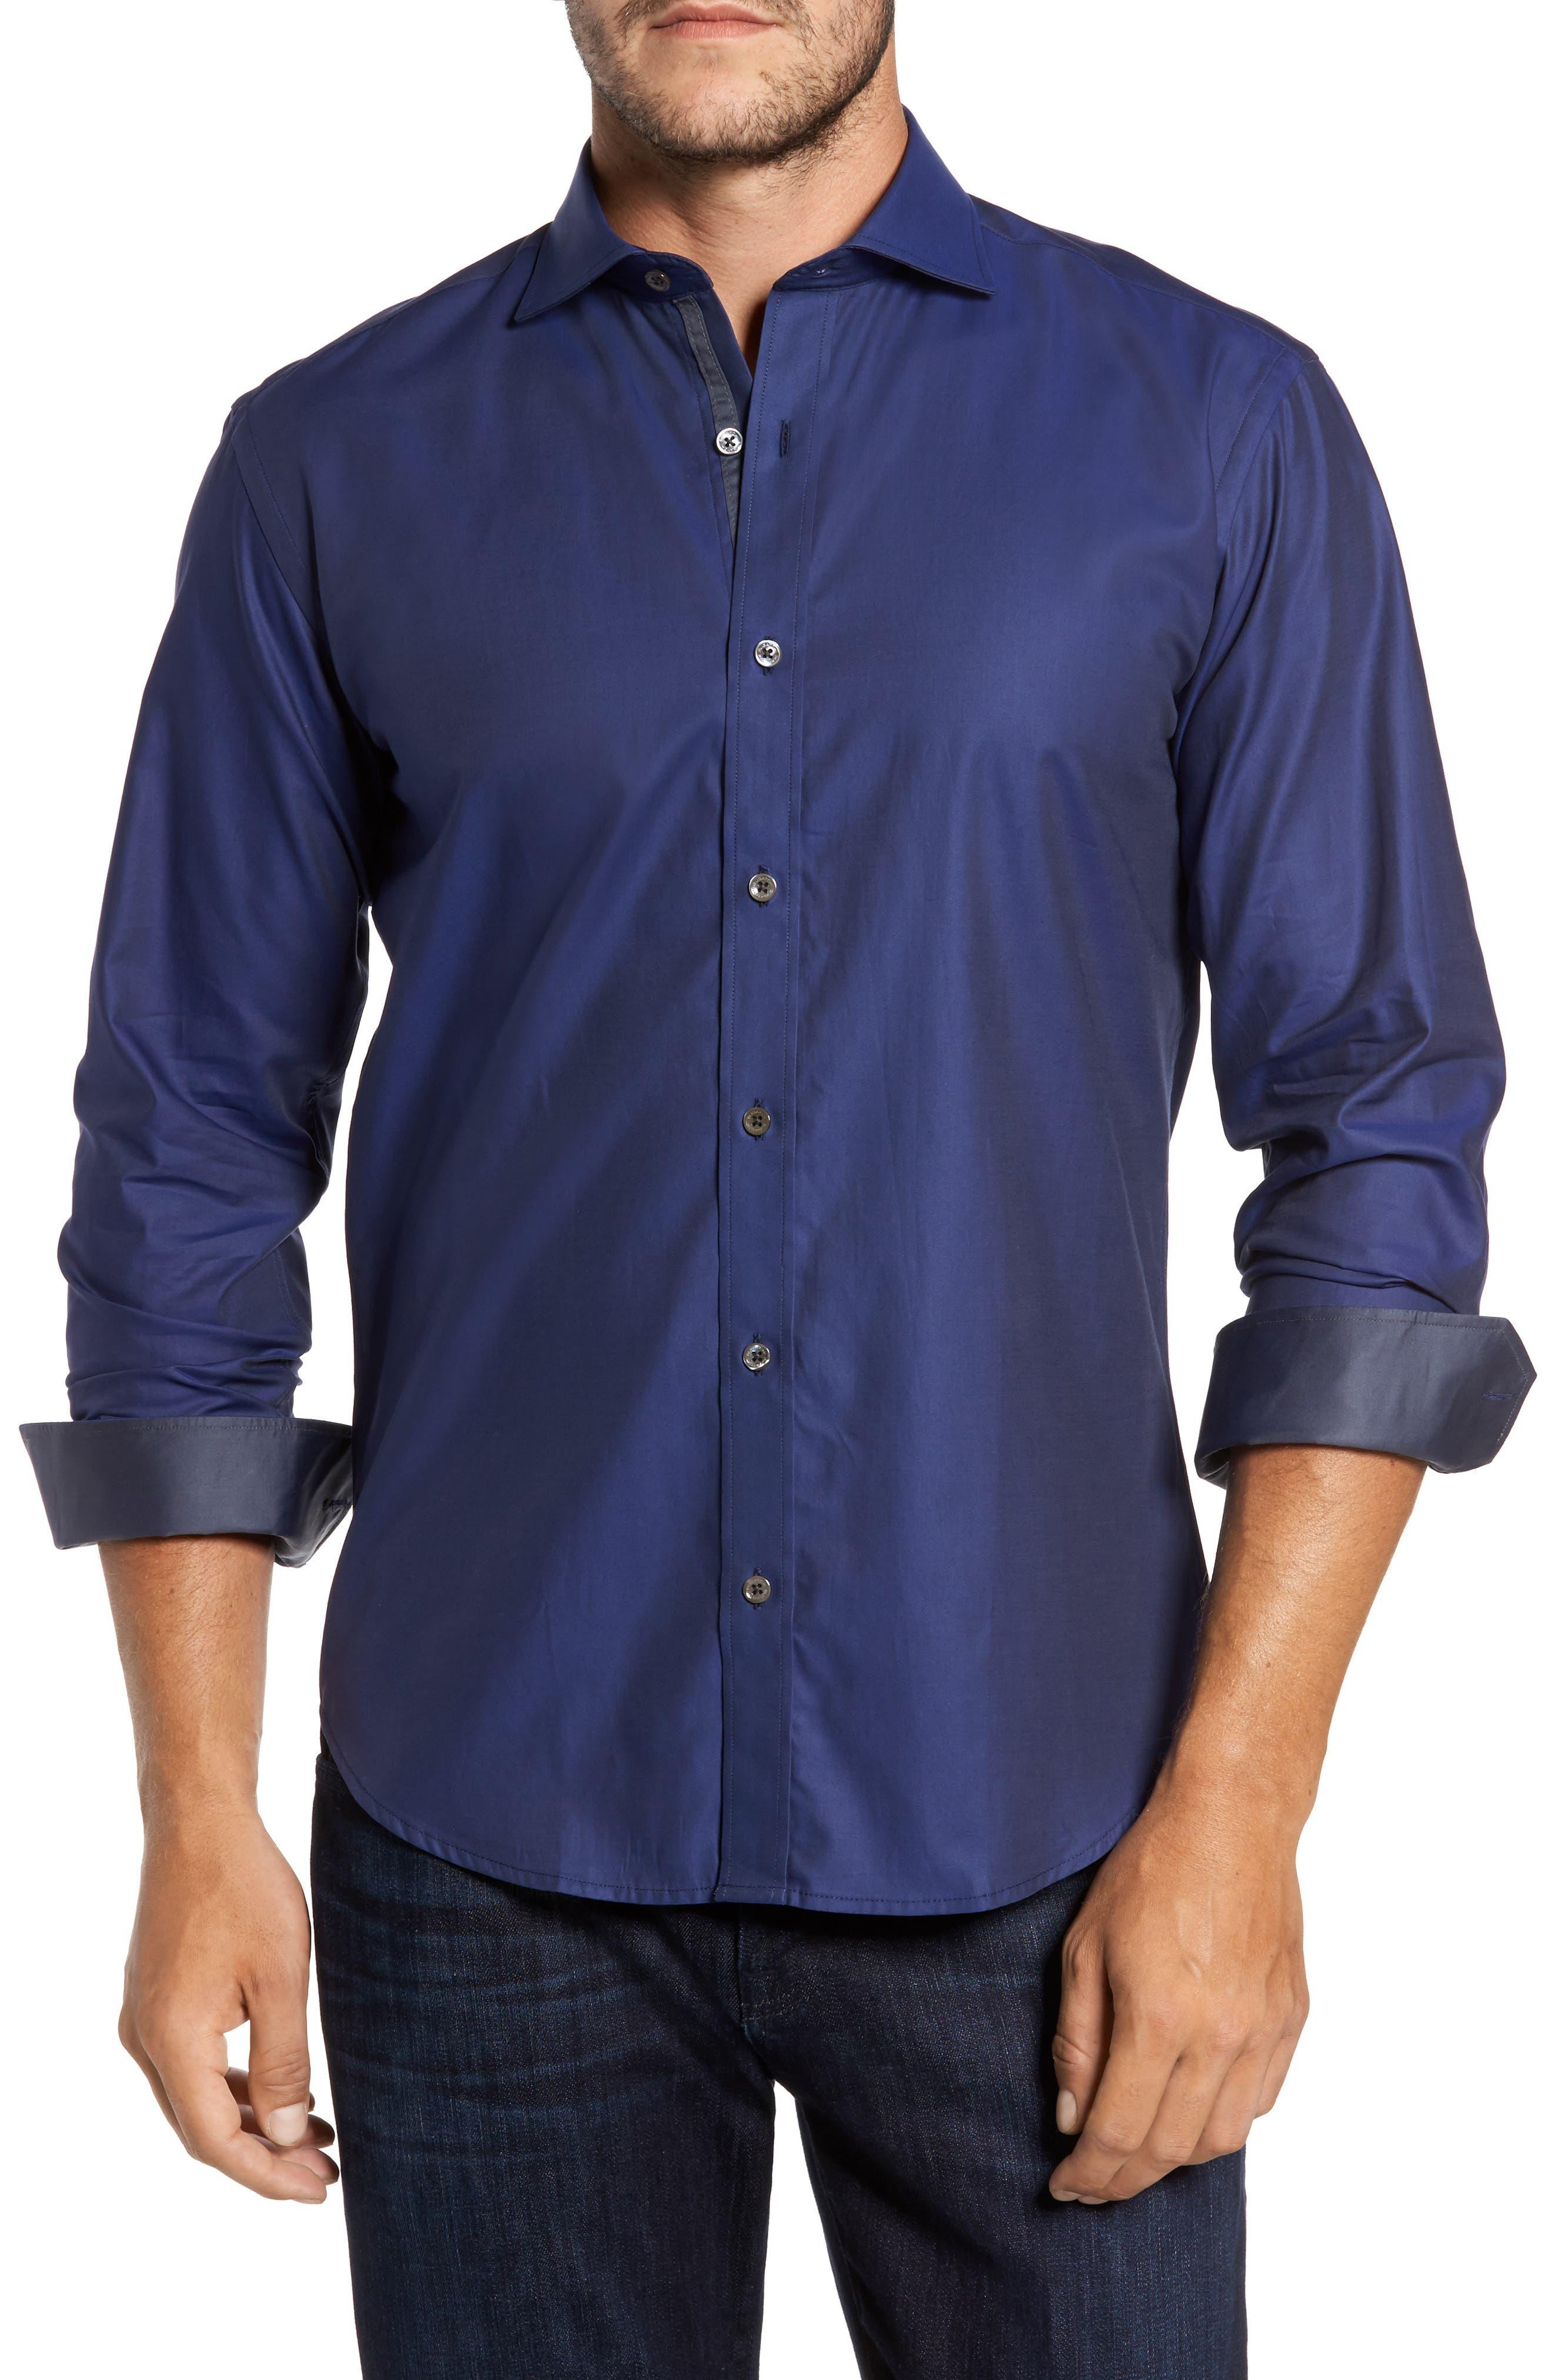 Main Image - Bugatchi Trim Fit Solid Sport Shirt